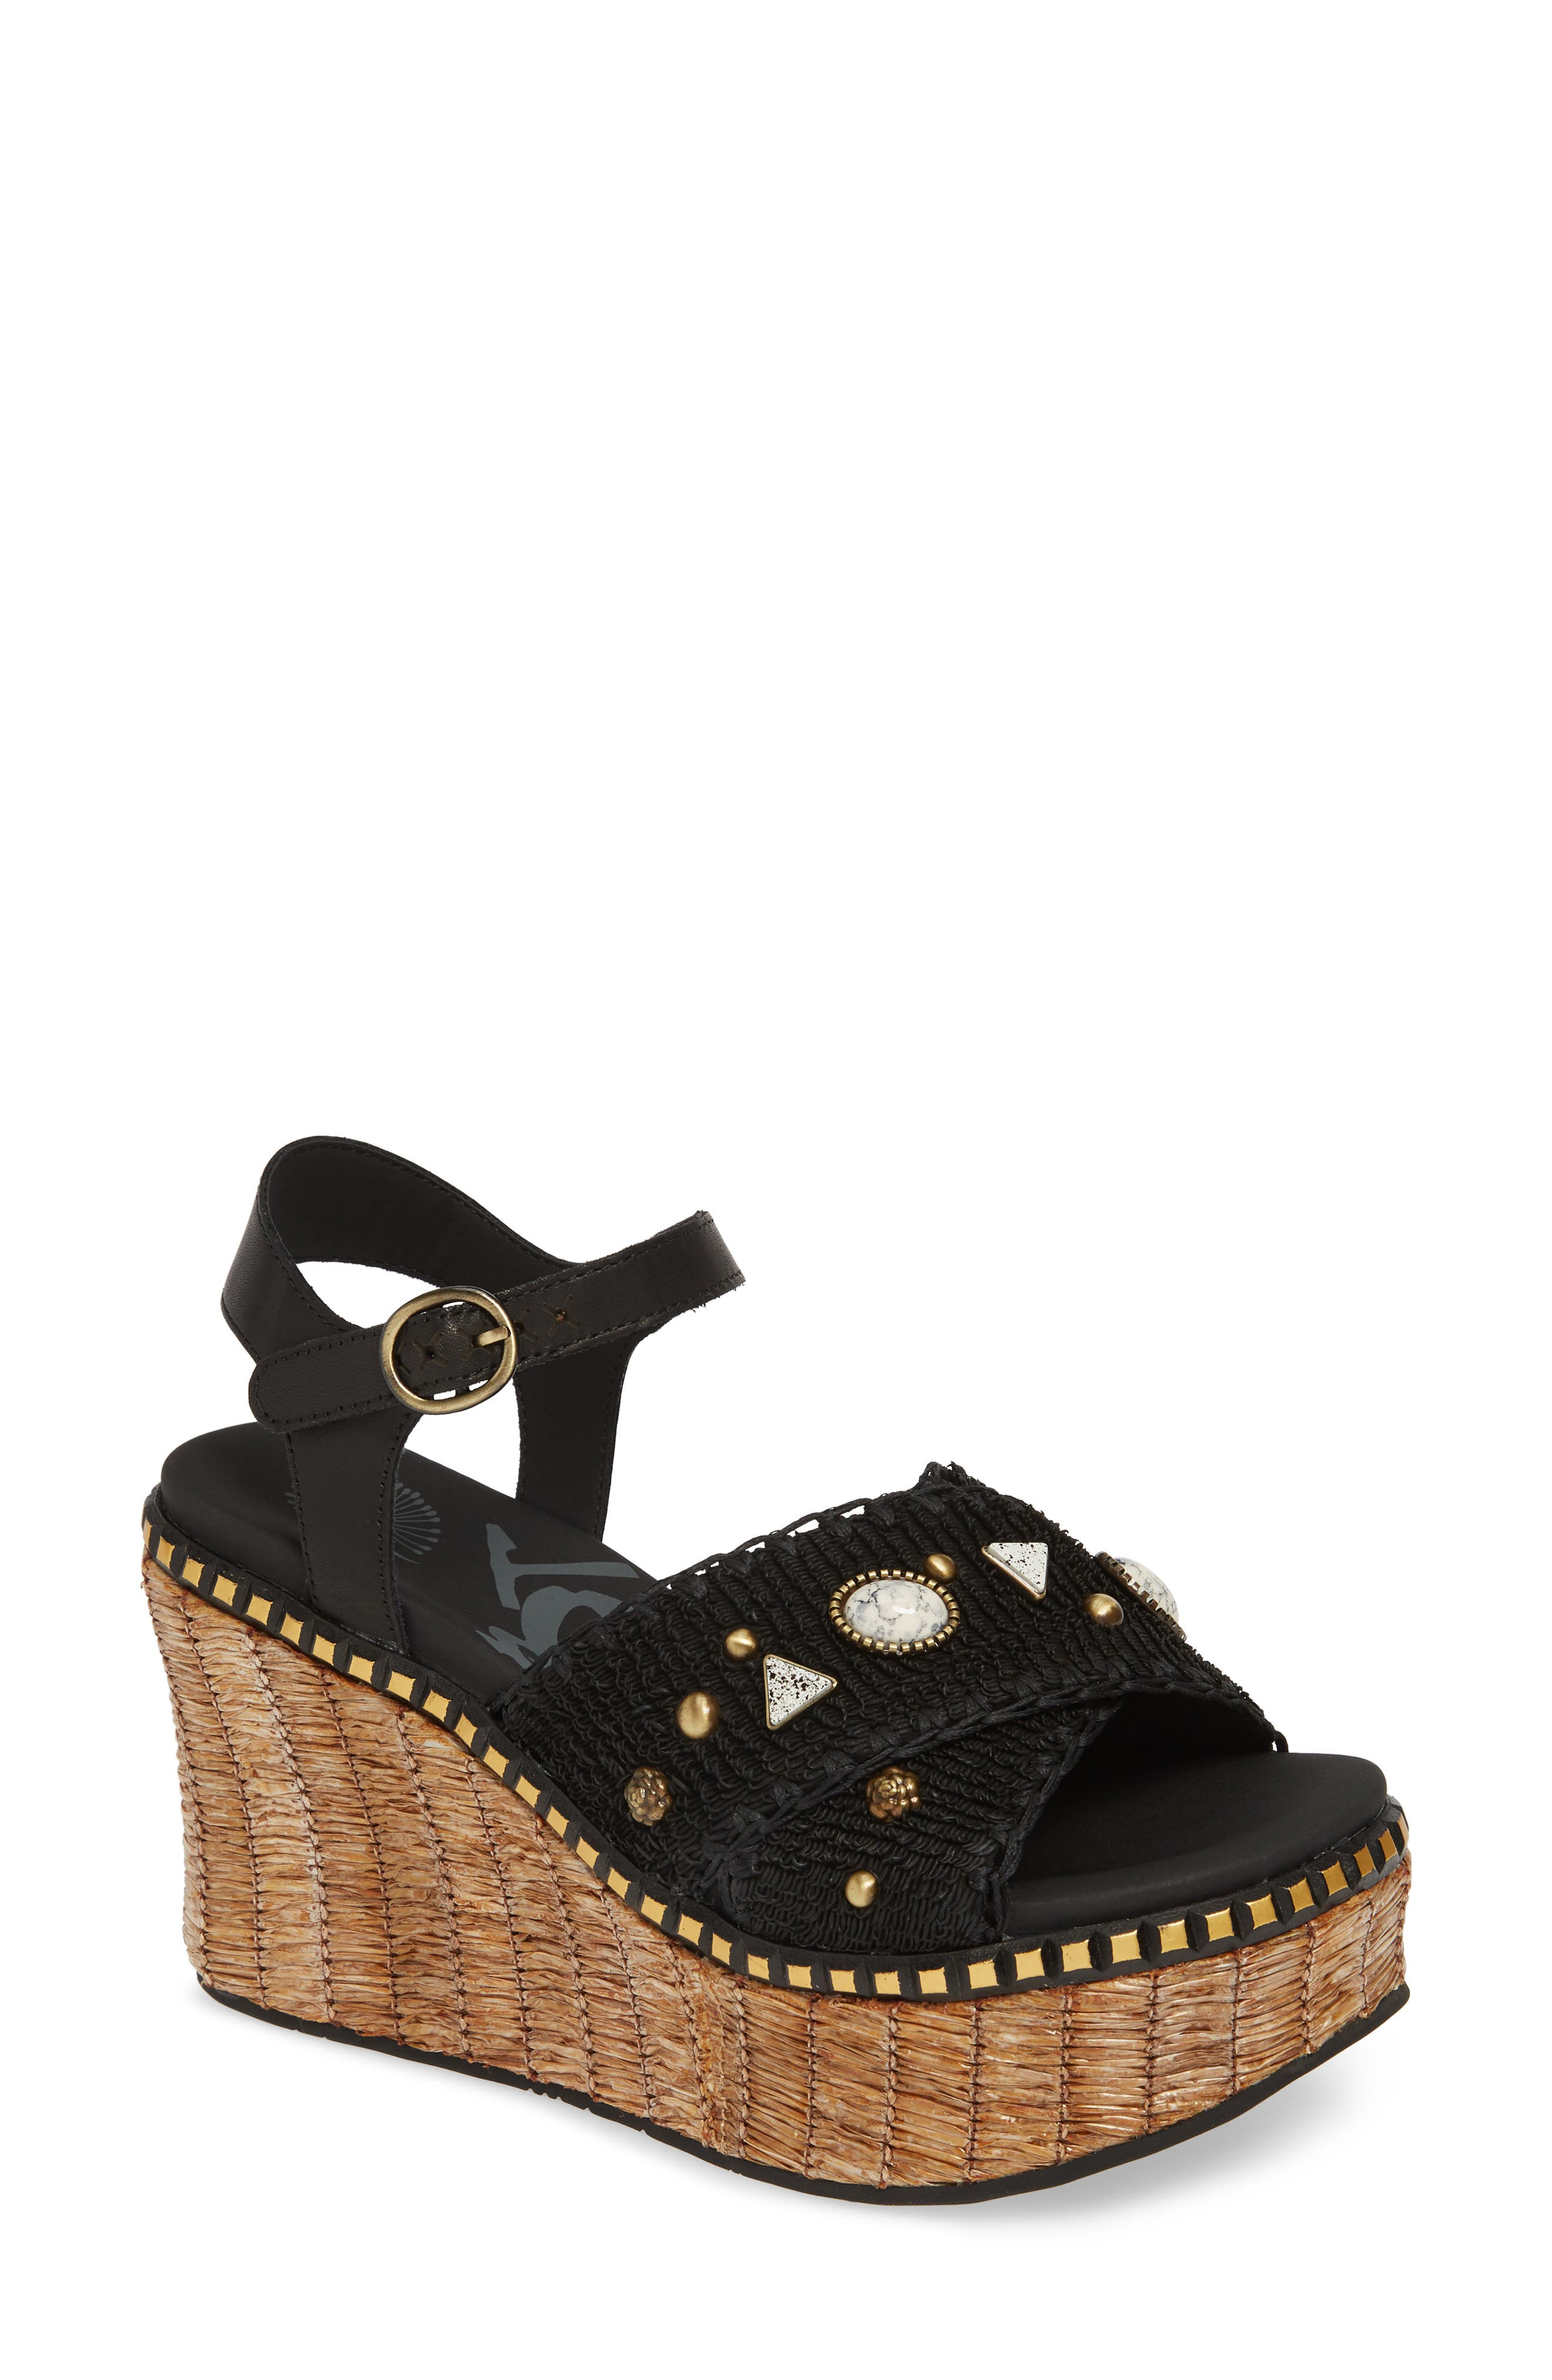 Cahoot Embellished Platform Wedge Sandal,                             Main thumbnail 1, color,                             BLACK LEATHER